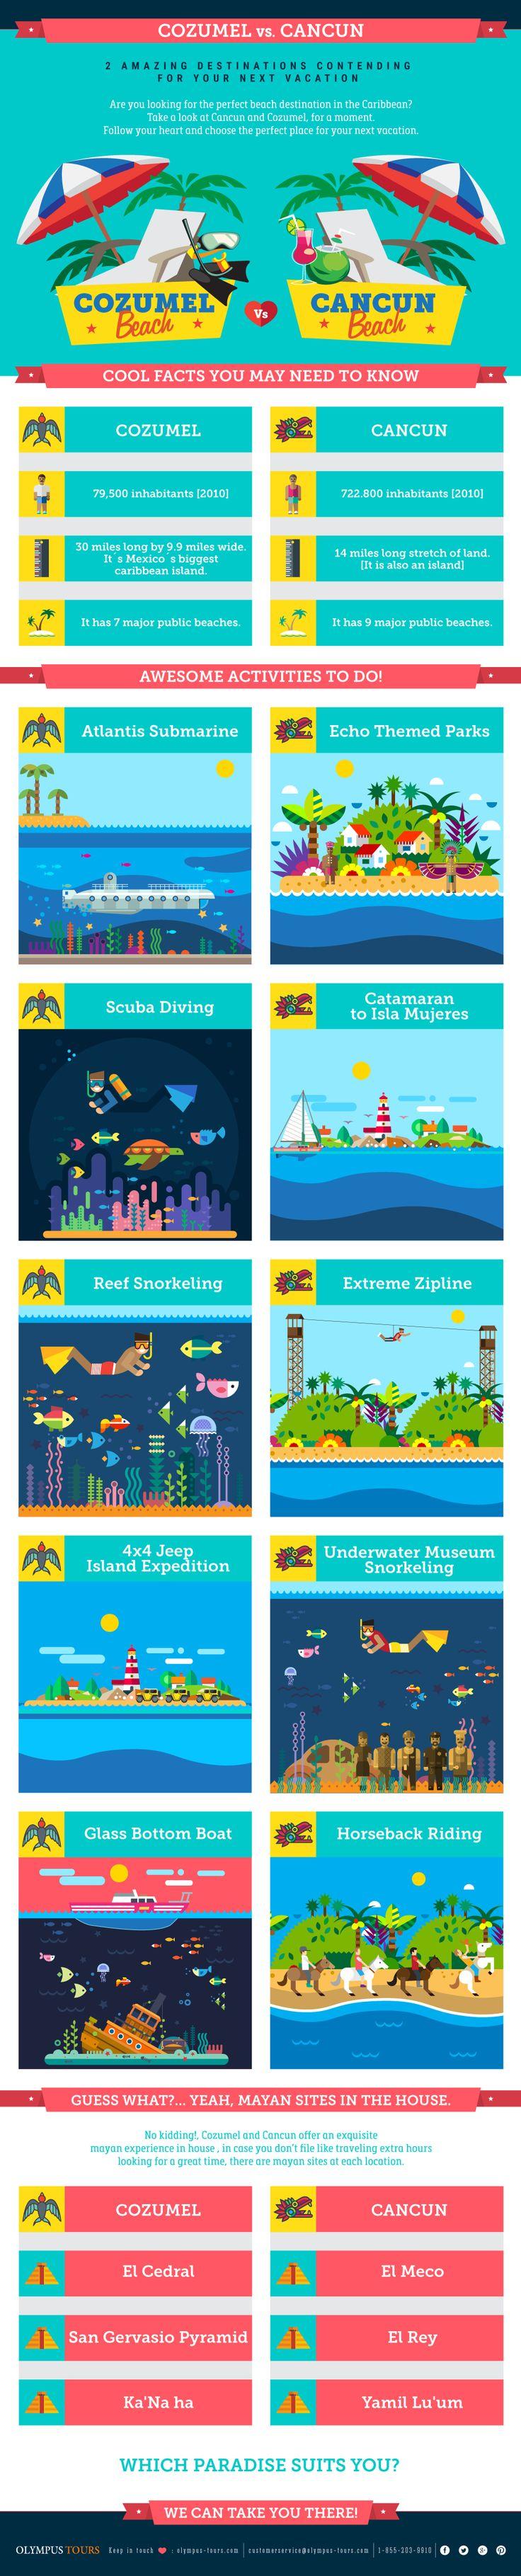 Cozumel vs. Cancun #infographic #Travel